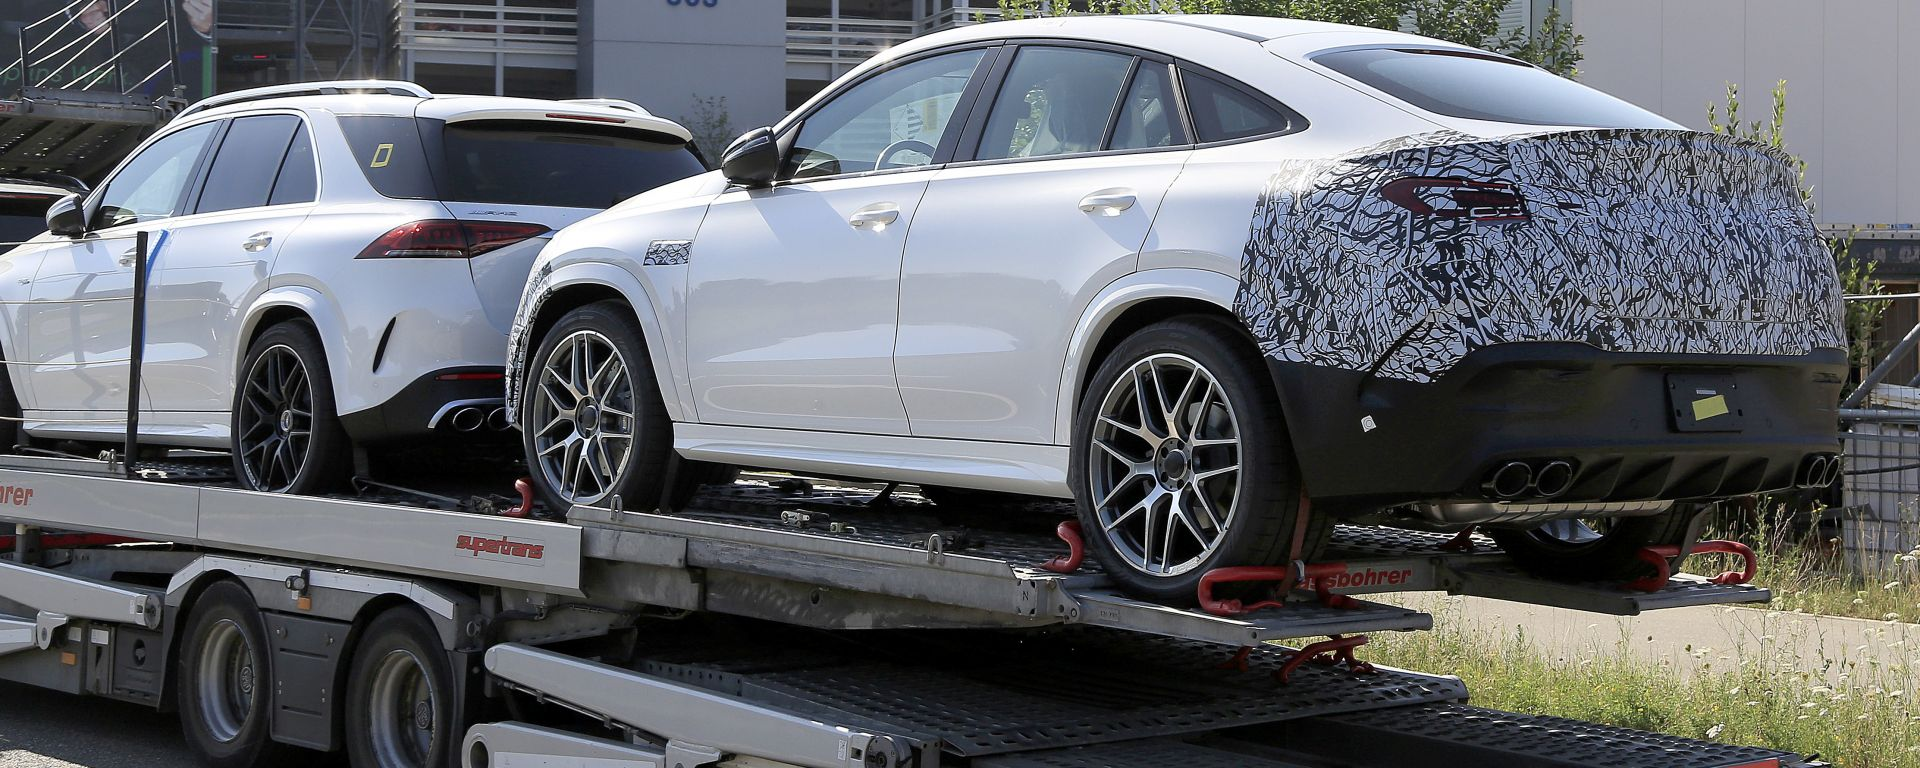 Nuova Mercedes GLE 2020